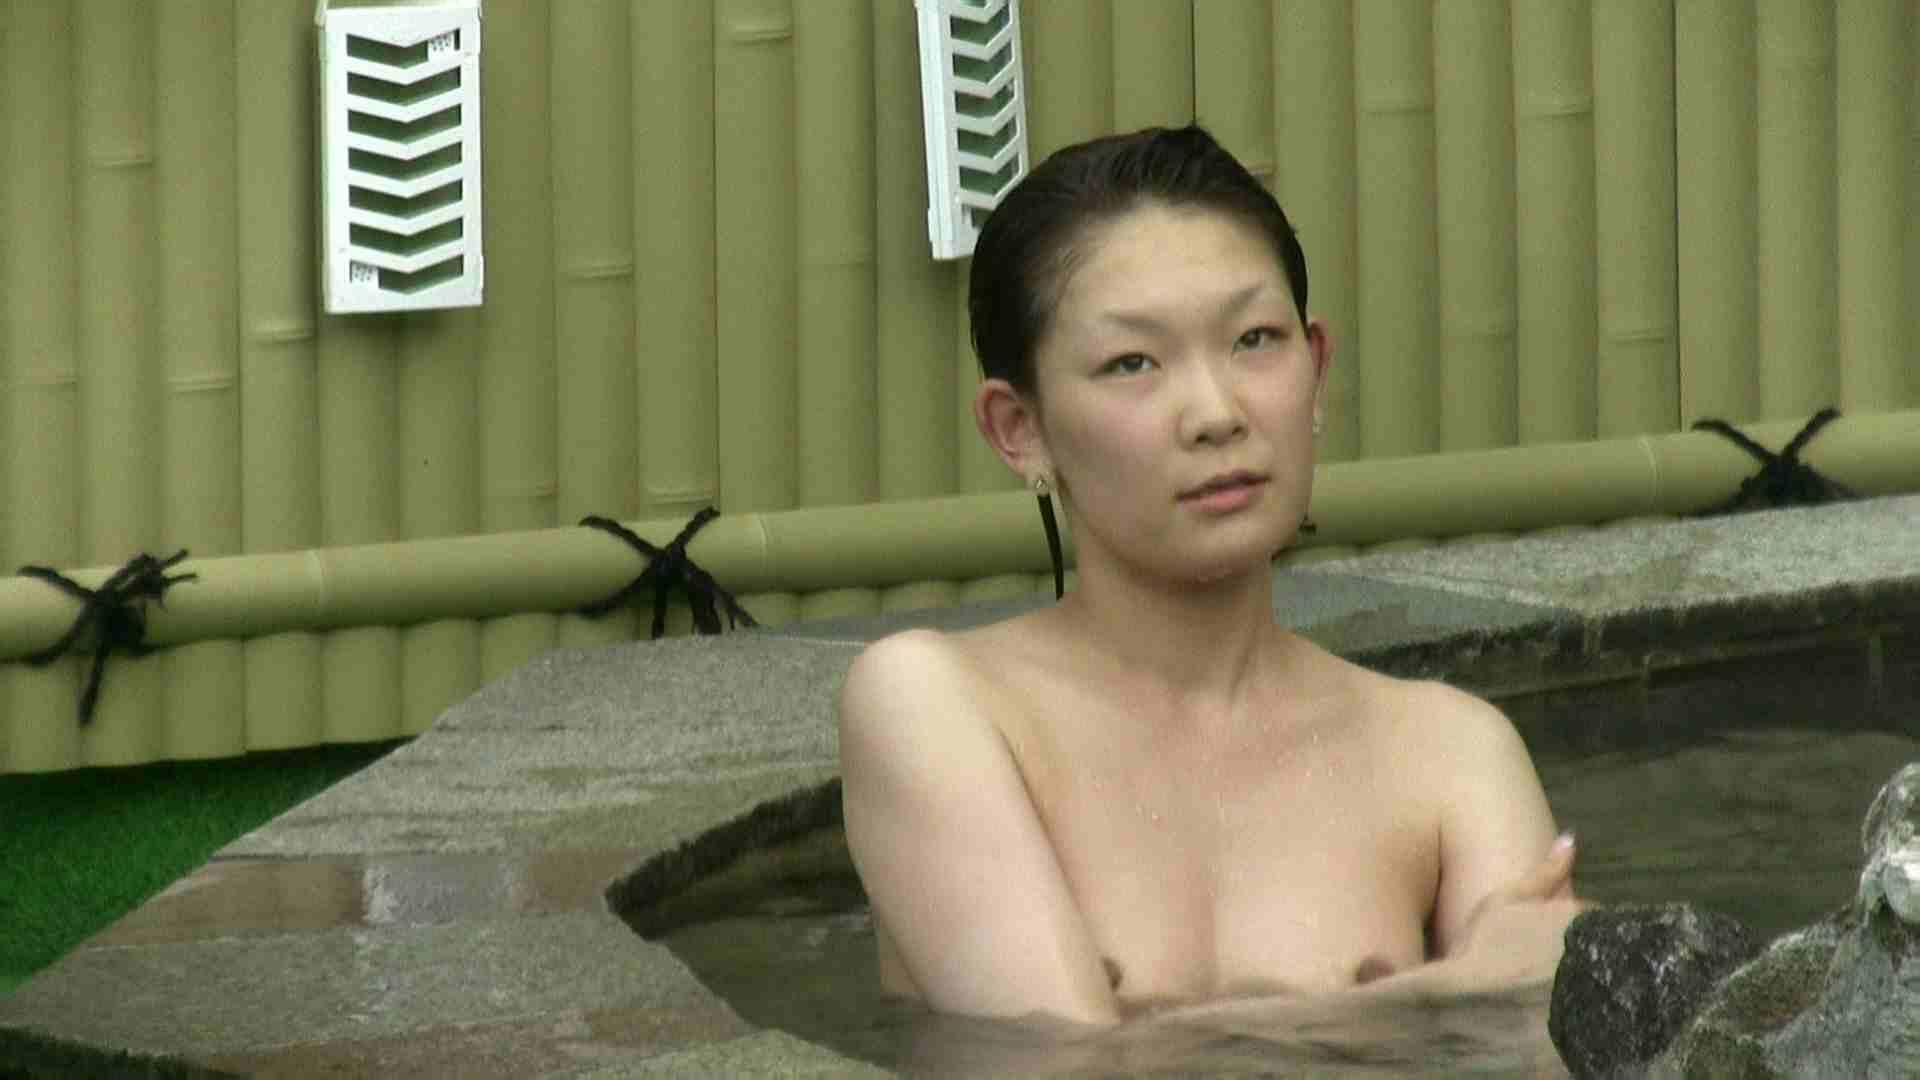 Aquaな露天風呂Vol.670 いやらしいOL アダルト動画キャプチャ 81連発 7